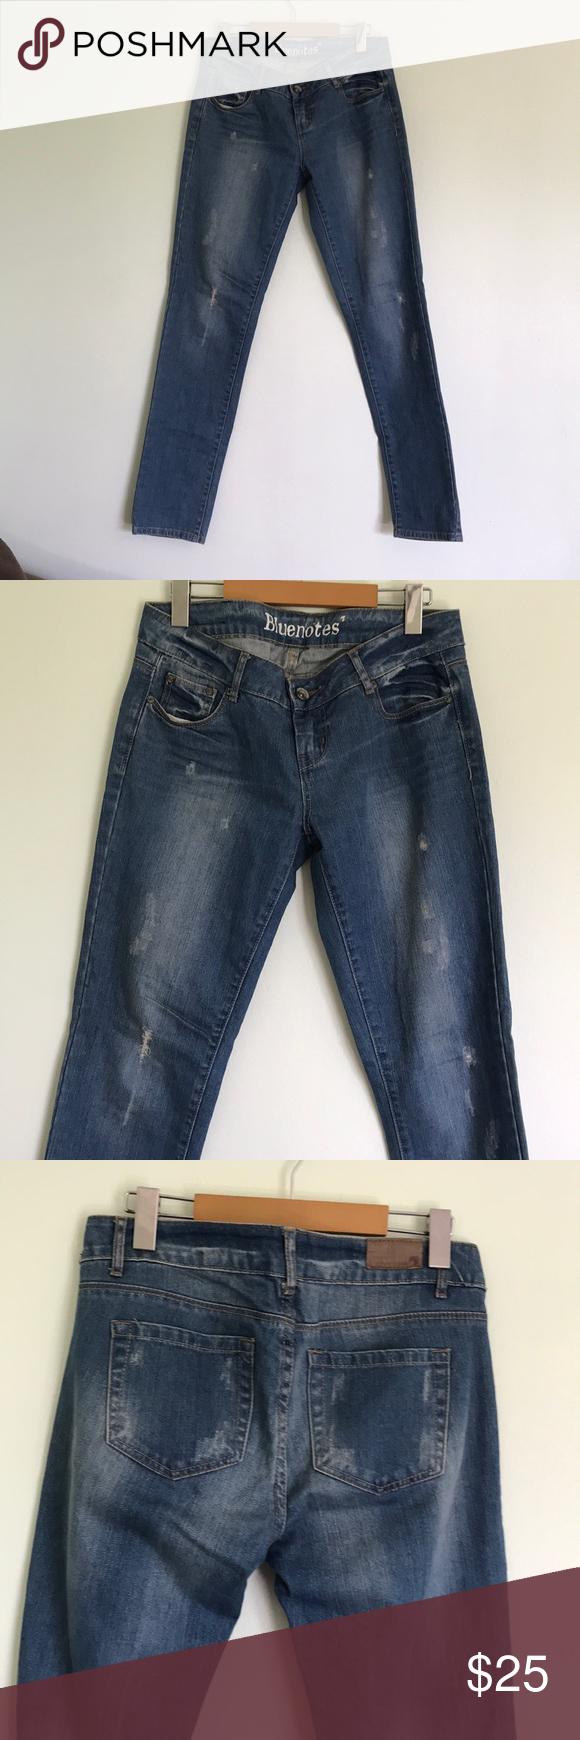 Bluenotes Jeans size 29 Light distressed light wash jeans  Inseam: 32 B0630 Bluenotes Jeans Straight Leg